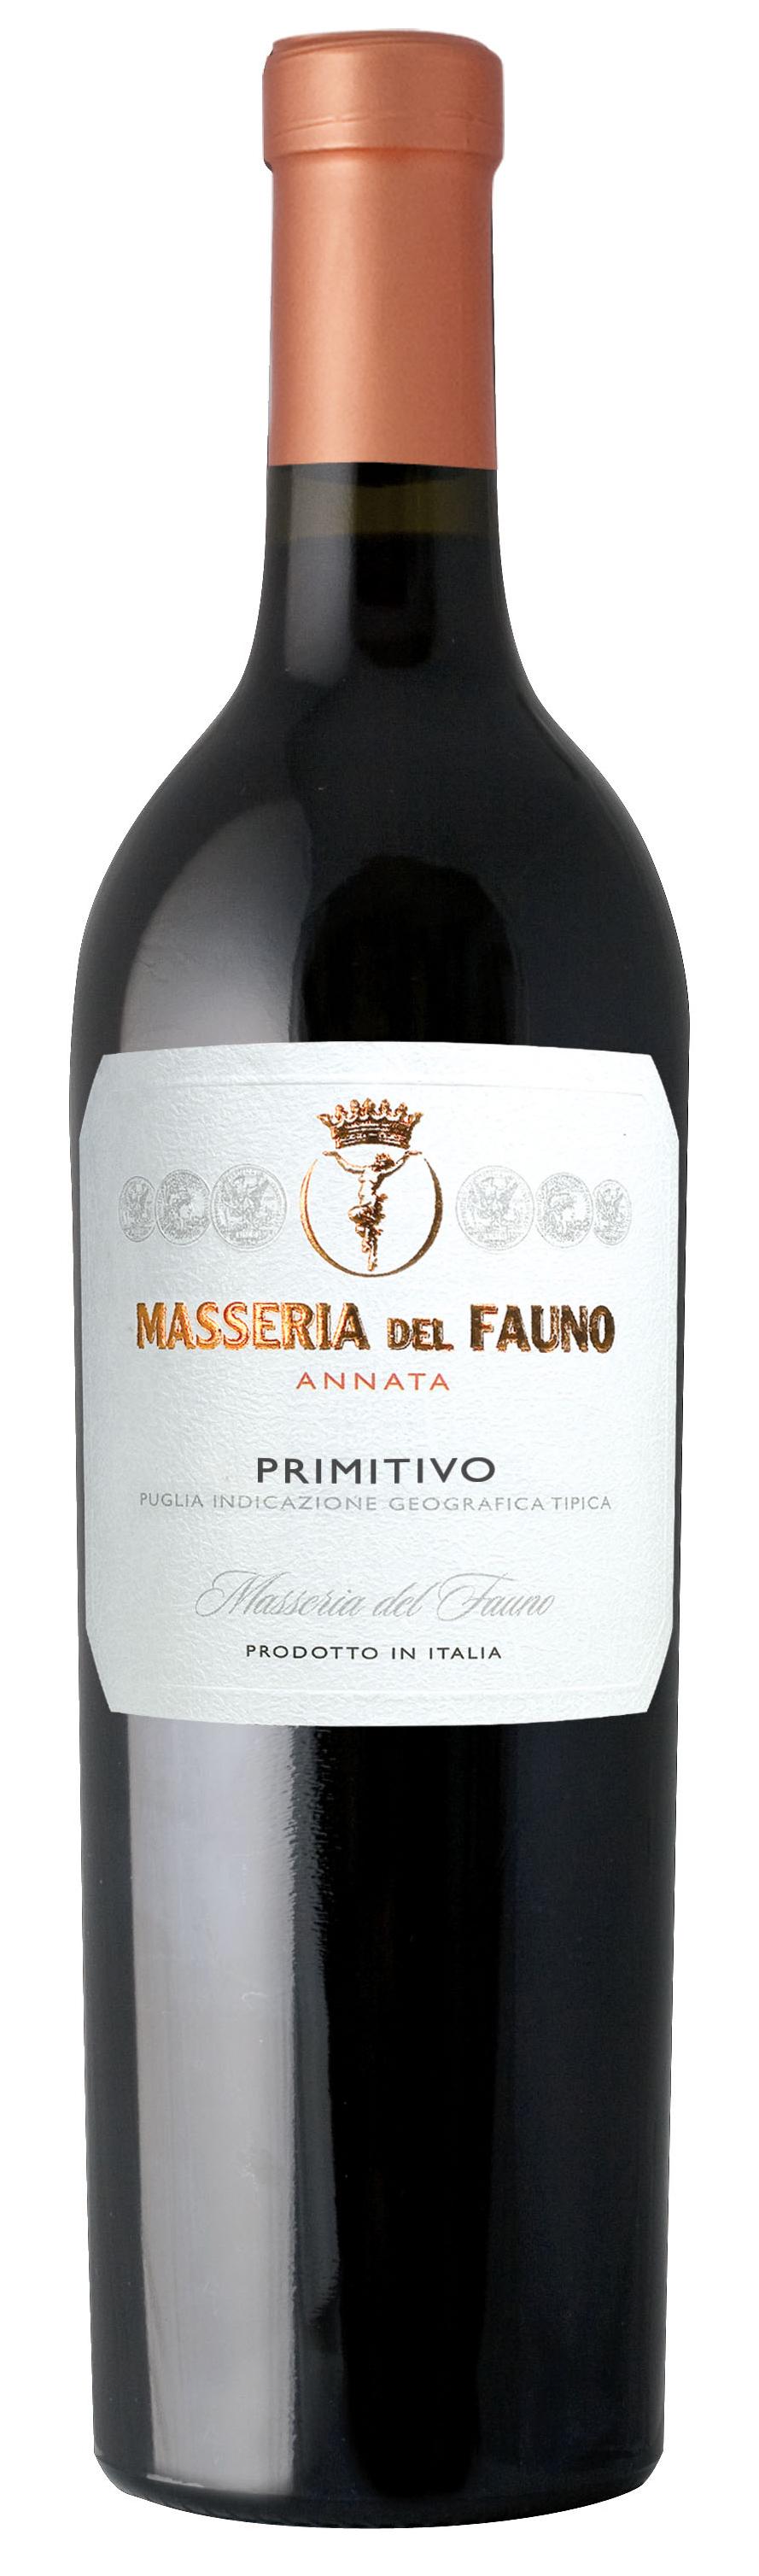 Masseria_Primitivo[1].jpg